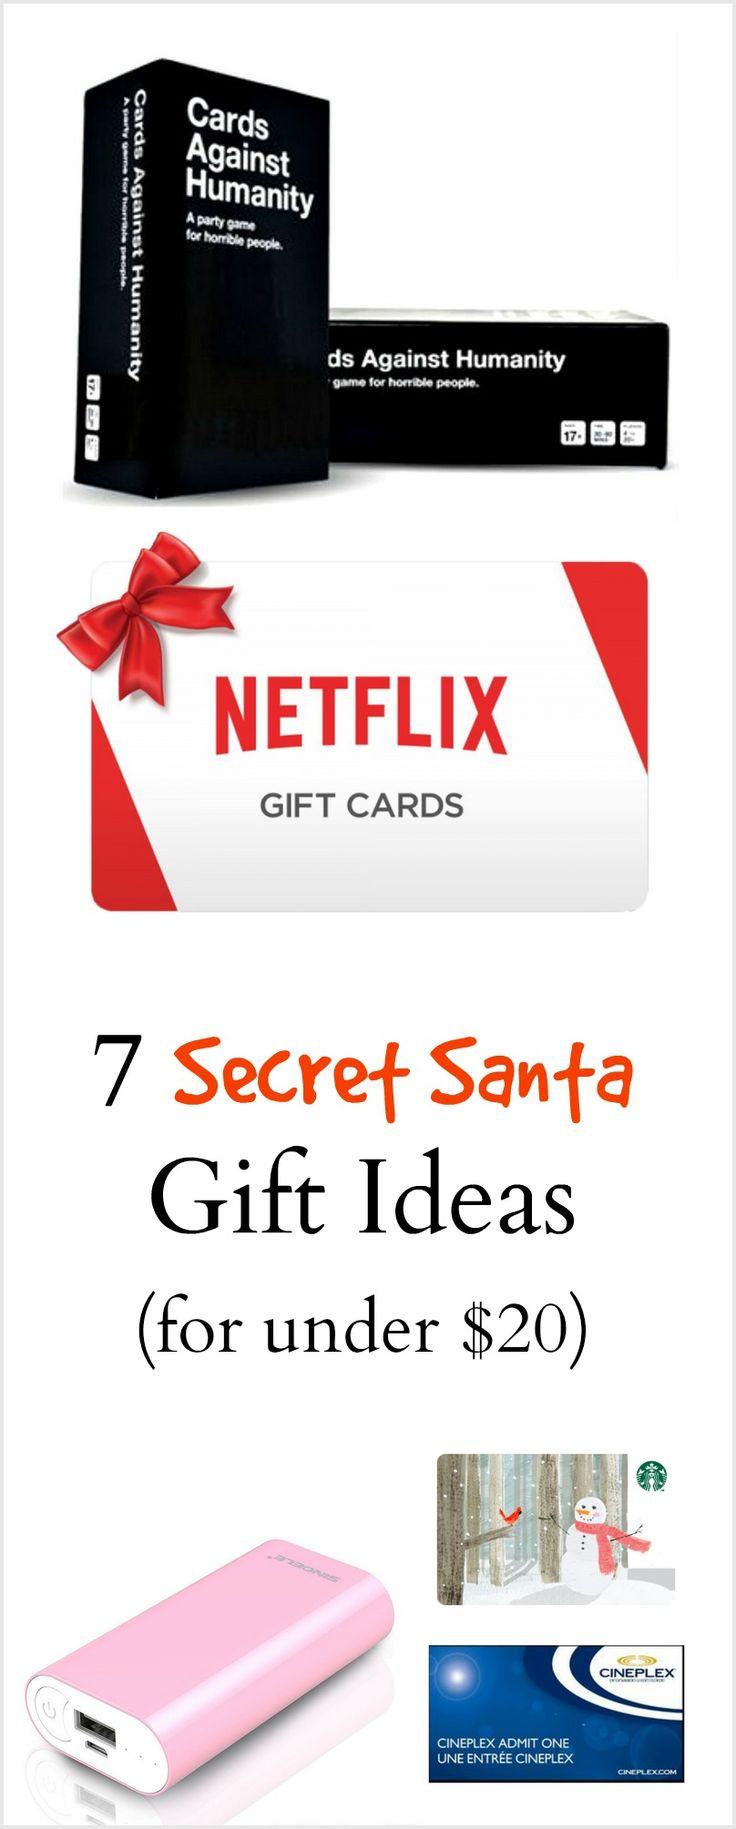 25 unique secret santa gifts ideas on pinterest secret santa santa gifts and secret sister gifts. Black Bedroom Furniture Sets. Home Design Ideas